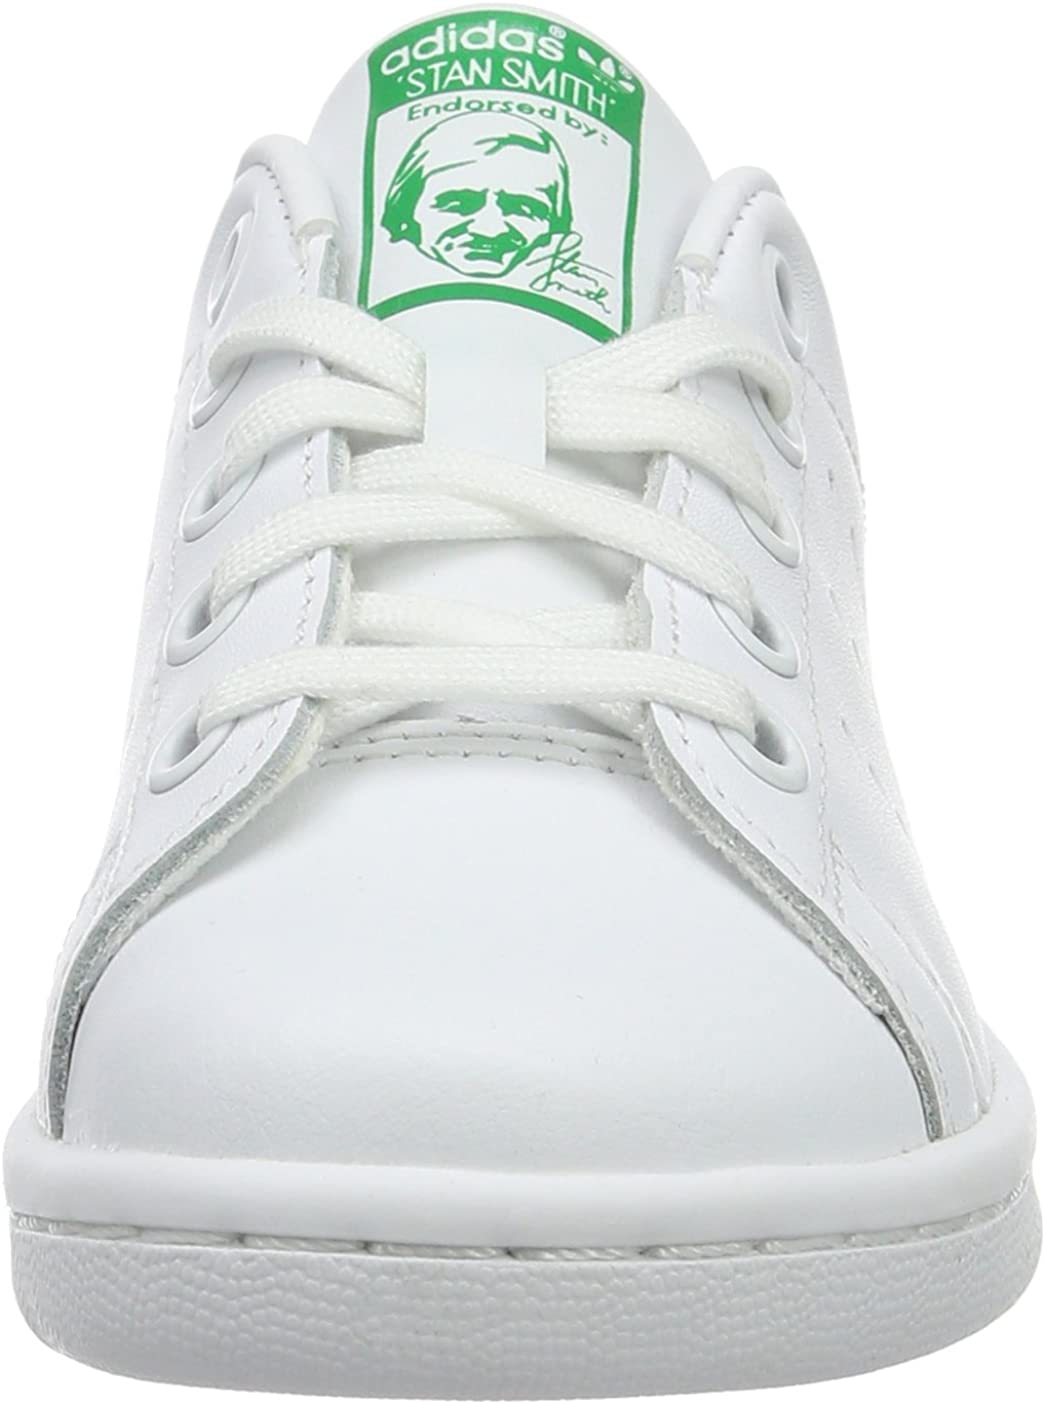 adidas Originals Stan Smith C White//Green Leather 12 M US Little Kid